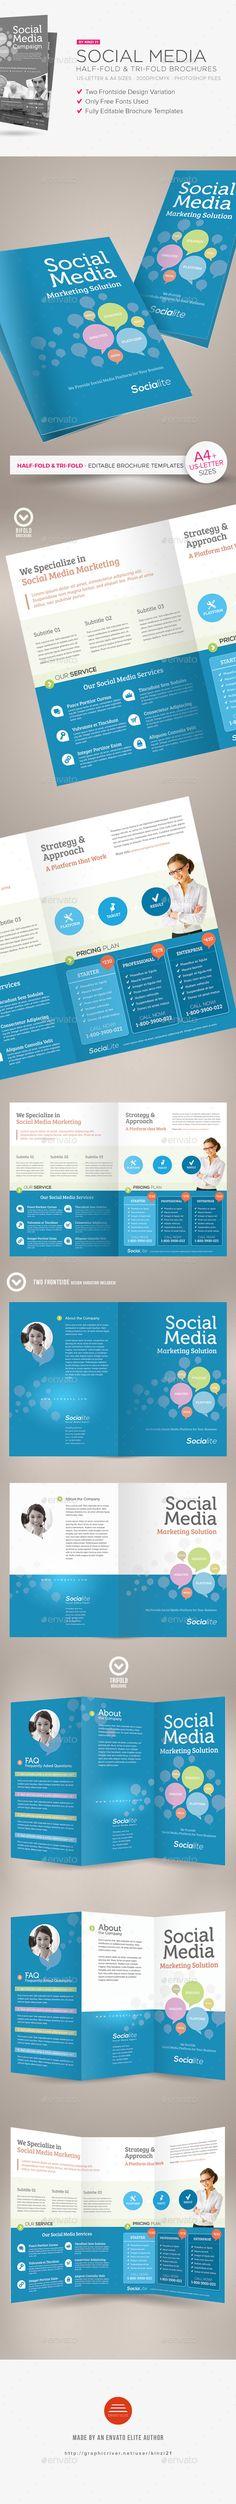 Social Media Half-fold and Tri-fold Brochures